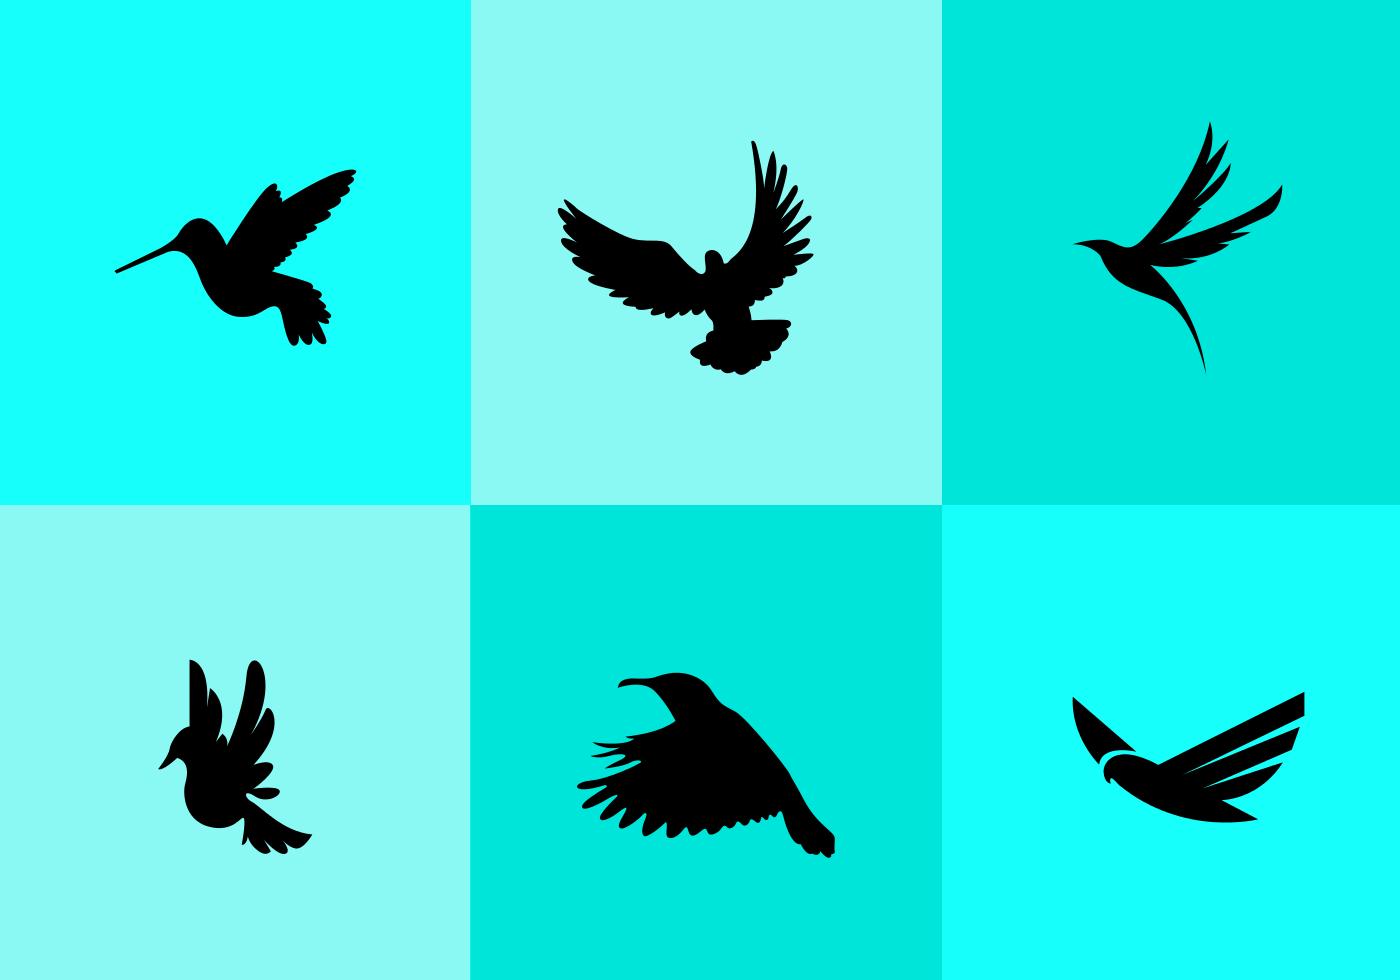 Bird Free Vector Art - (18598 Free Downloads) - photo#12